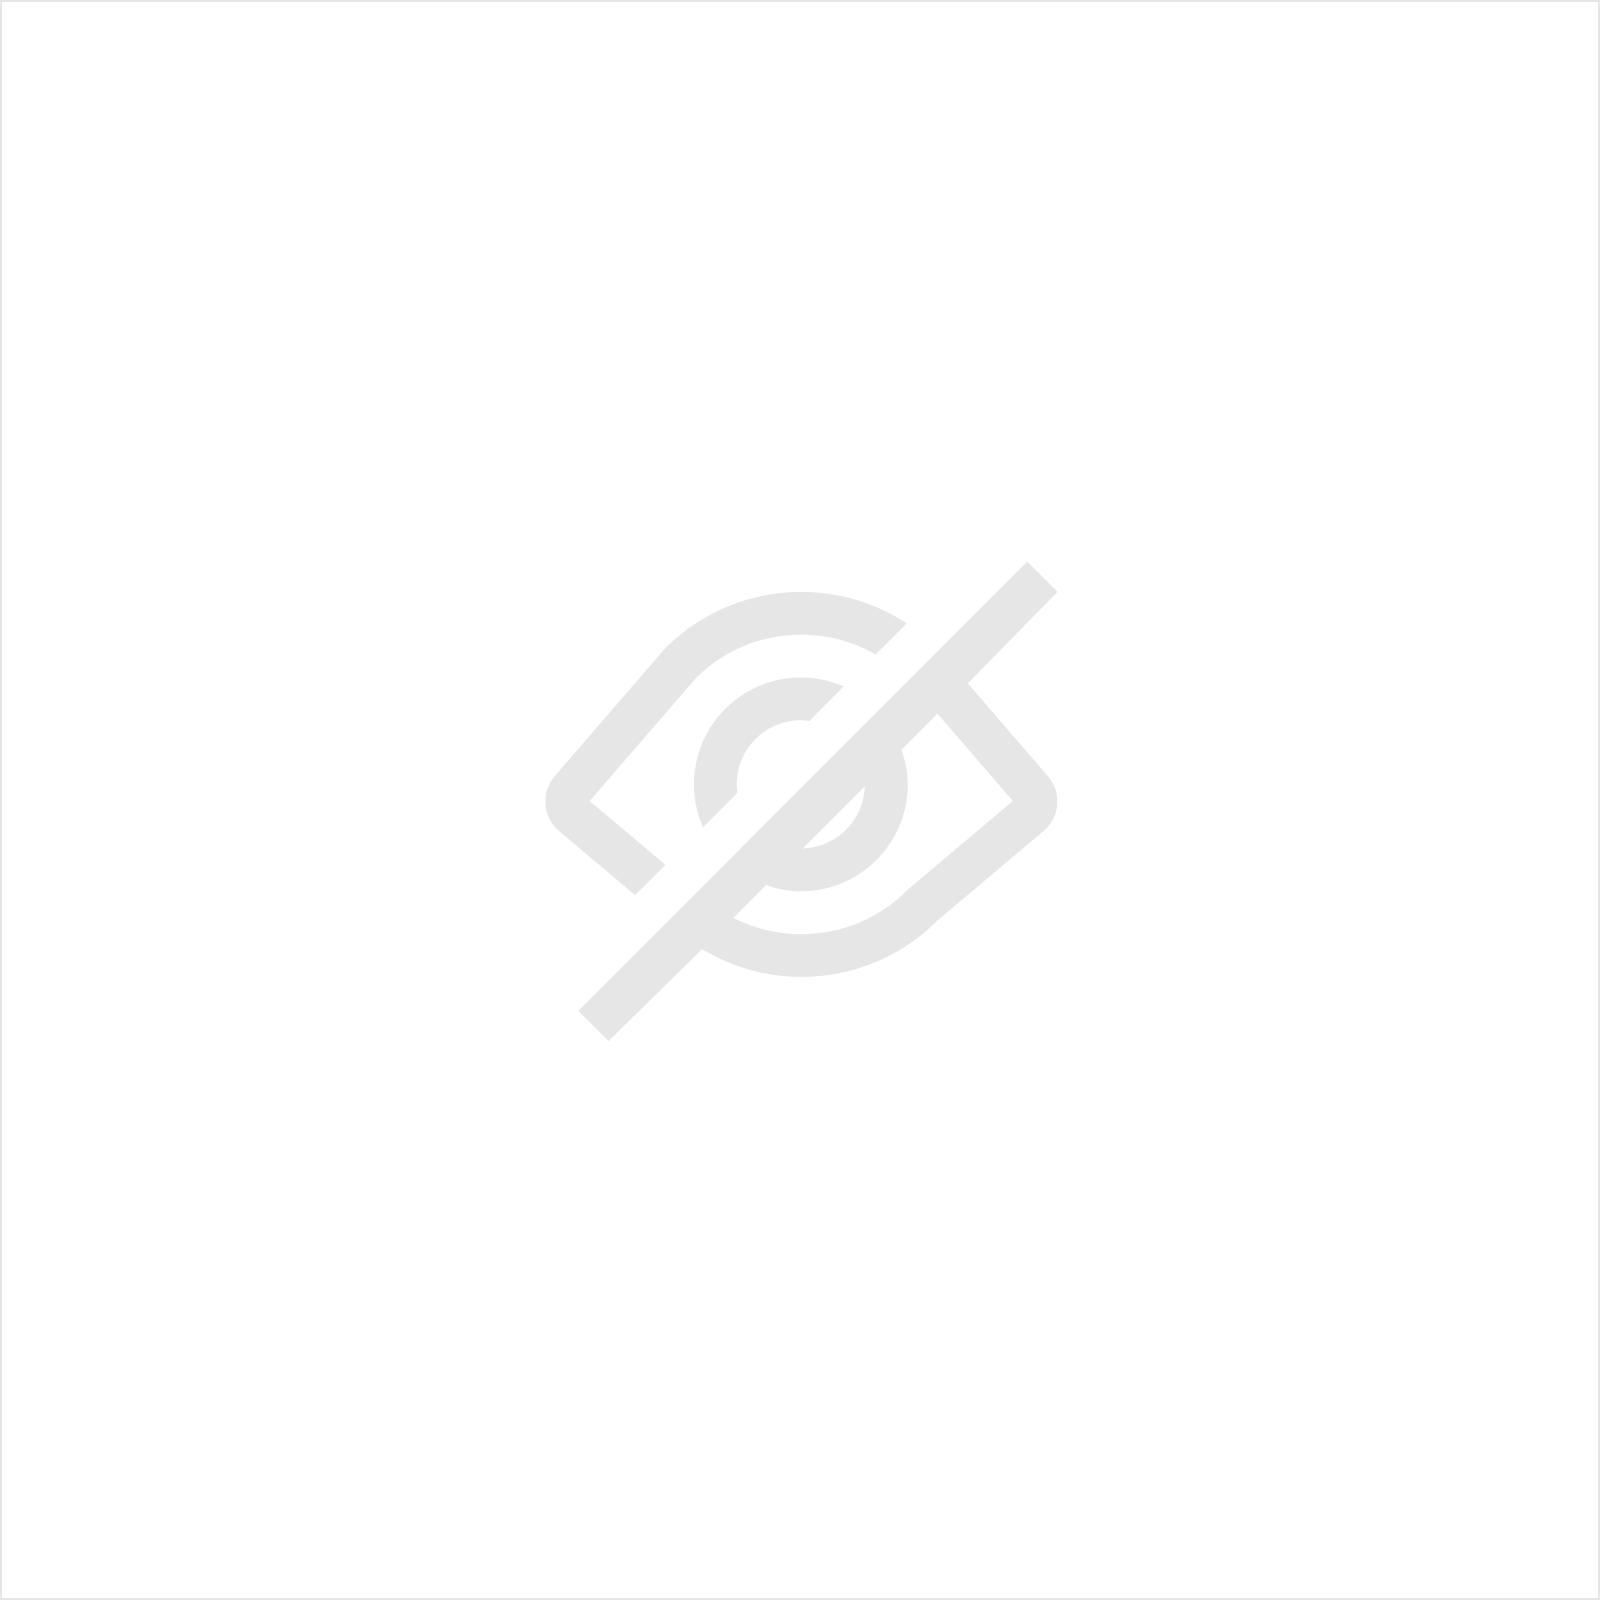 STRAALCABINE SKAT BLAST 945 INKL. STOFAFZUIGING VAC-50